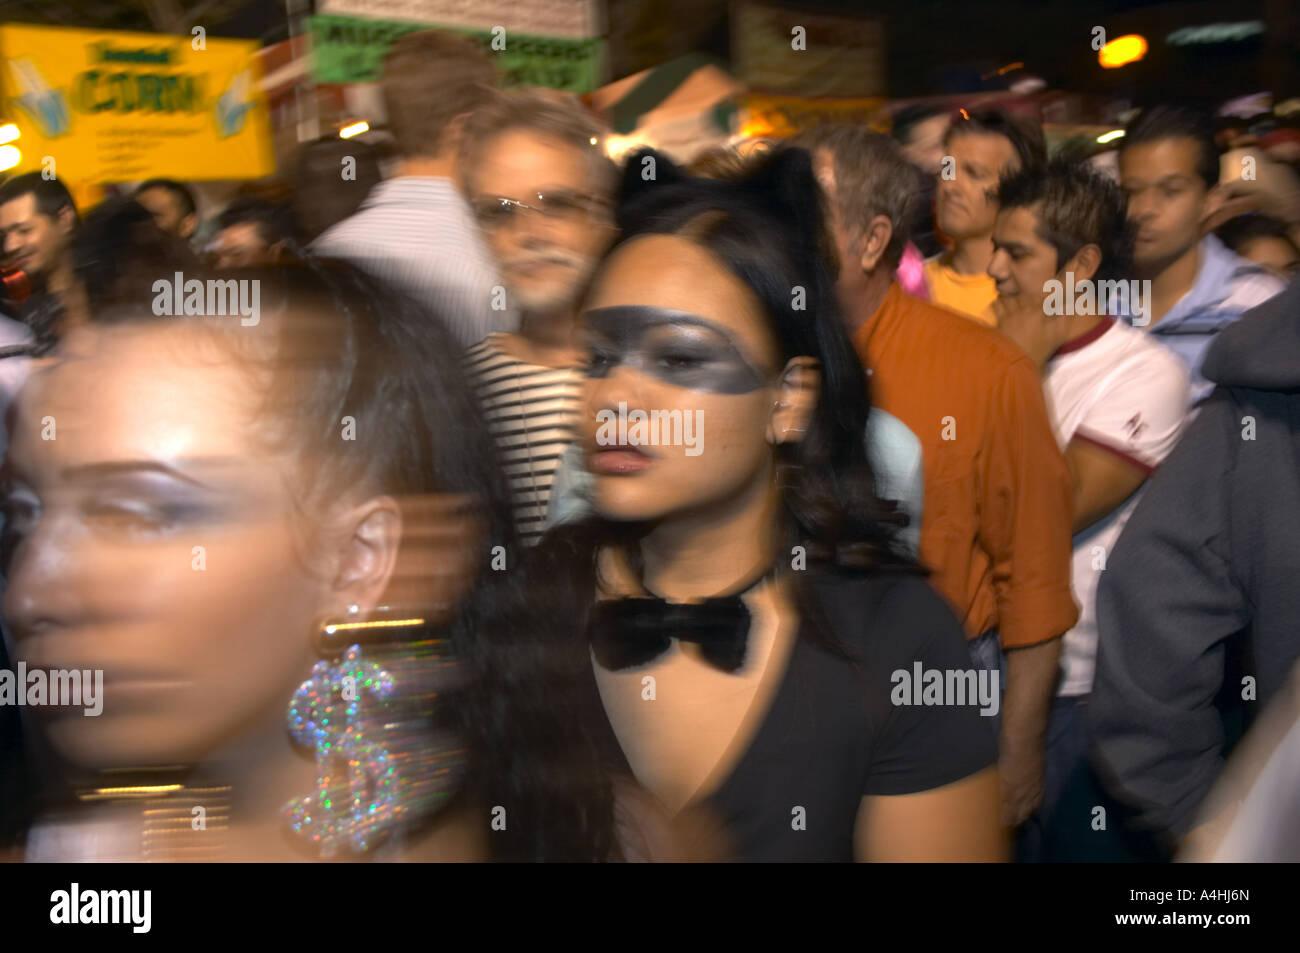 hollywood california halloween parade stock photos & hollywood